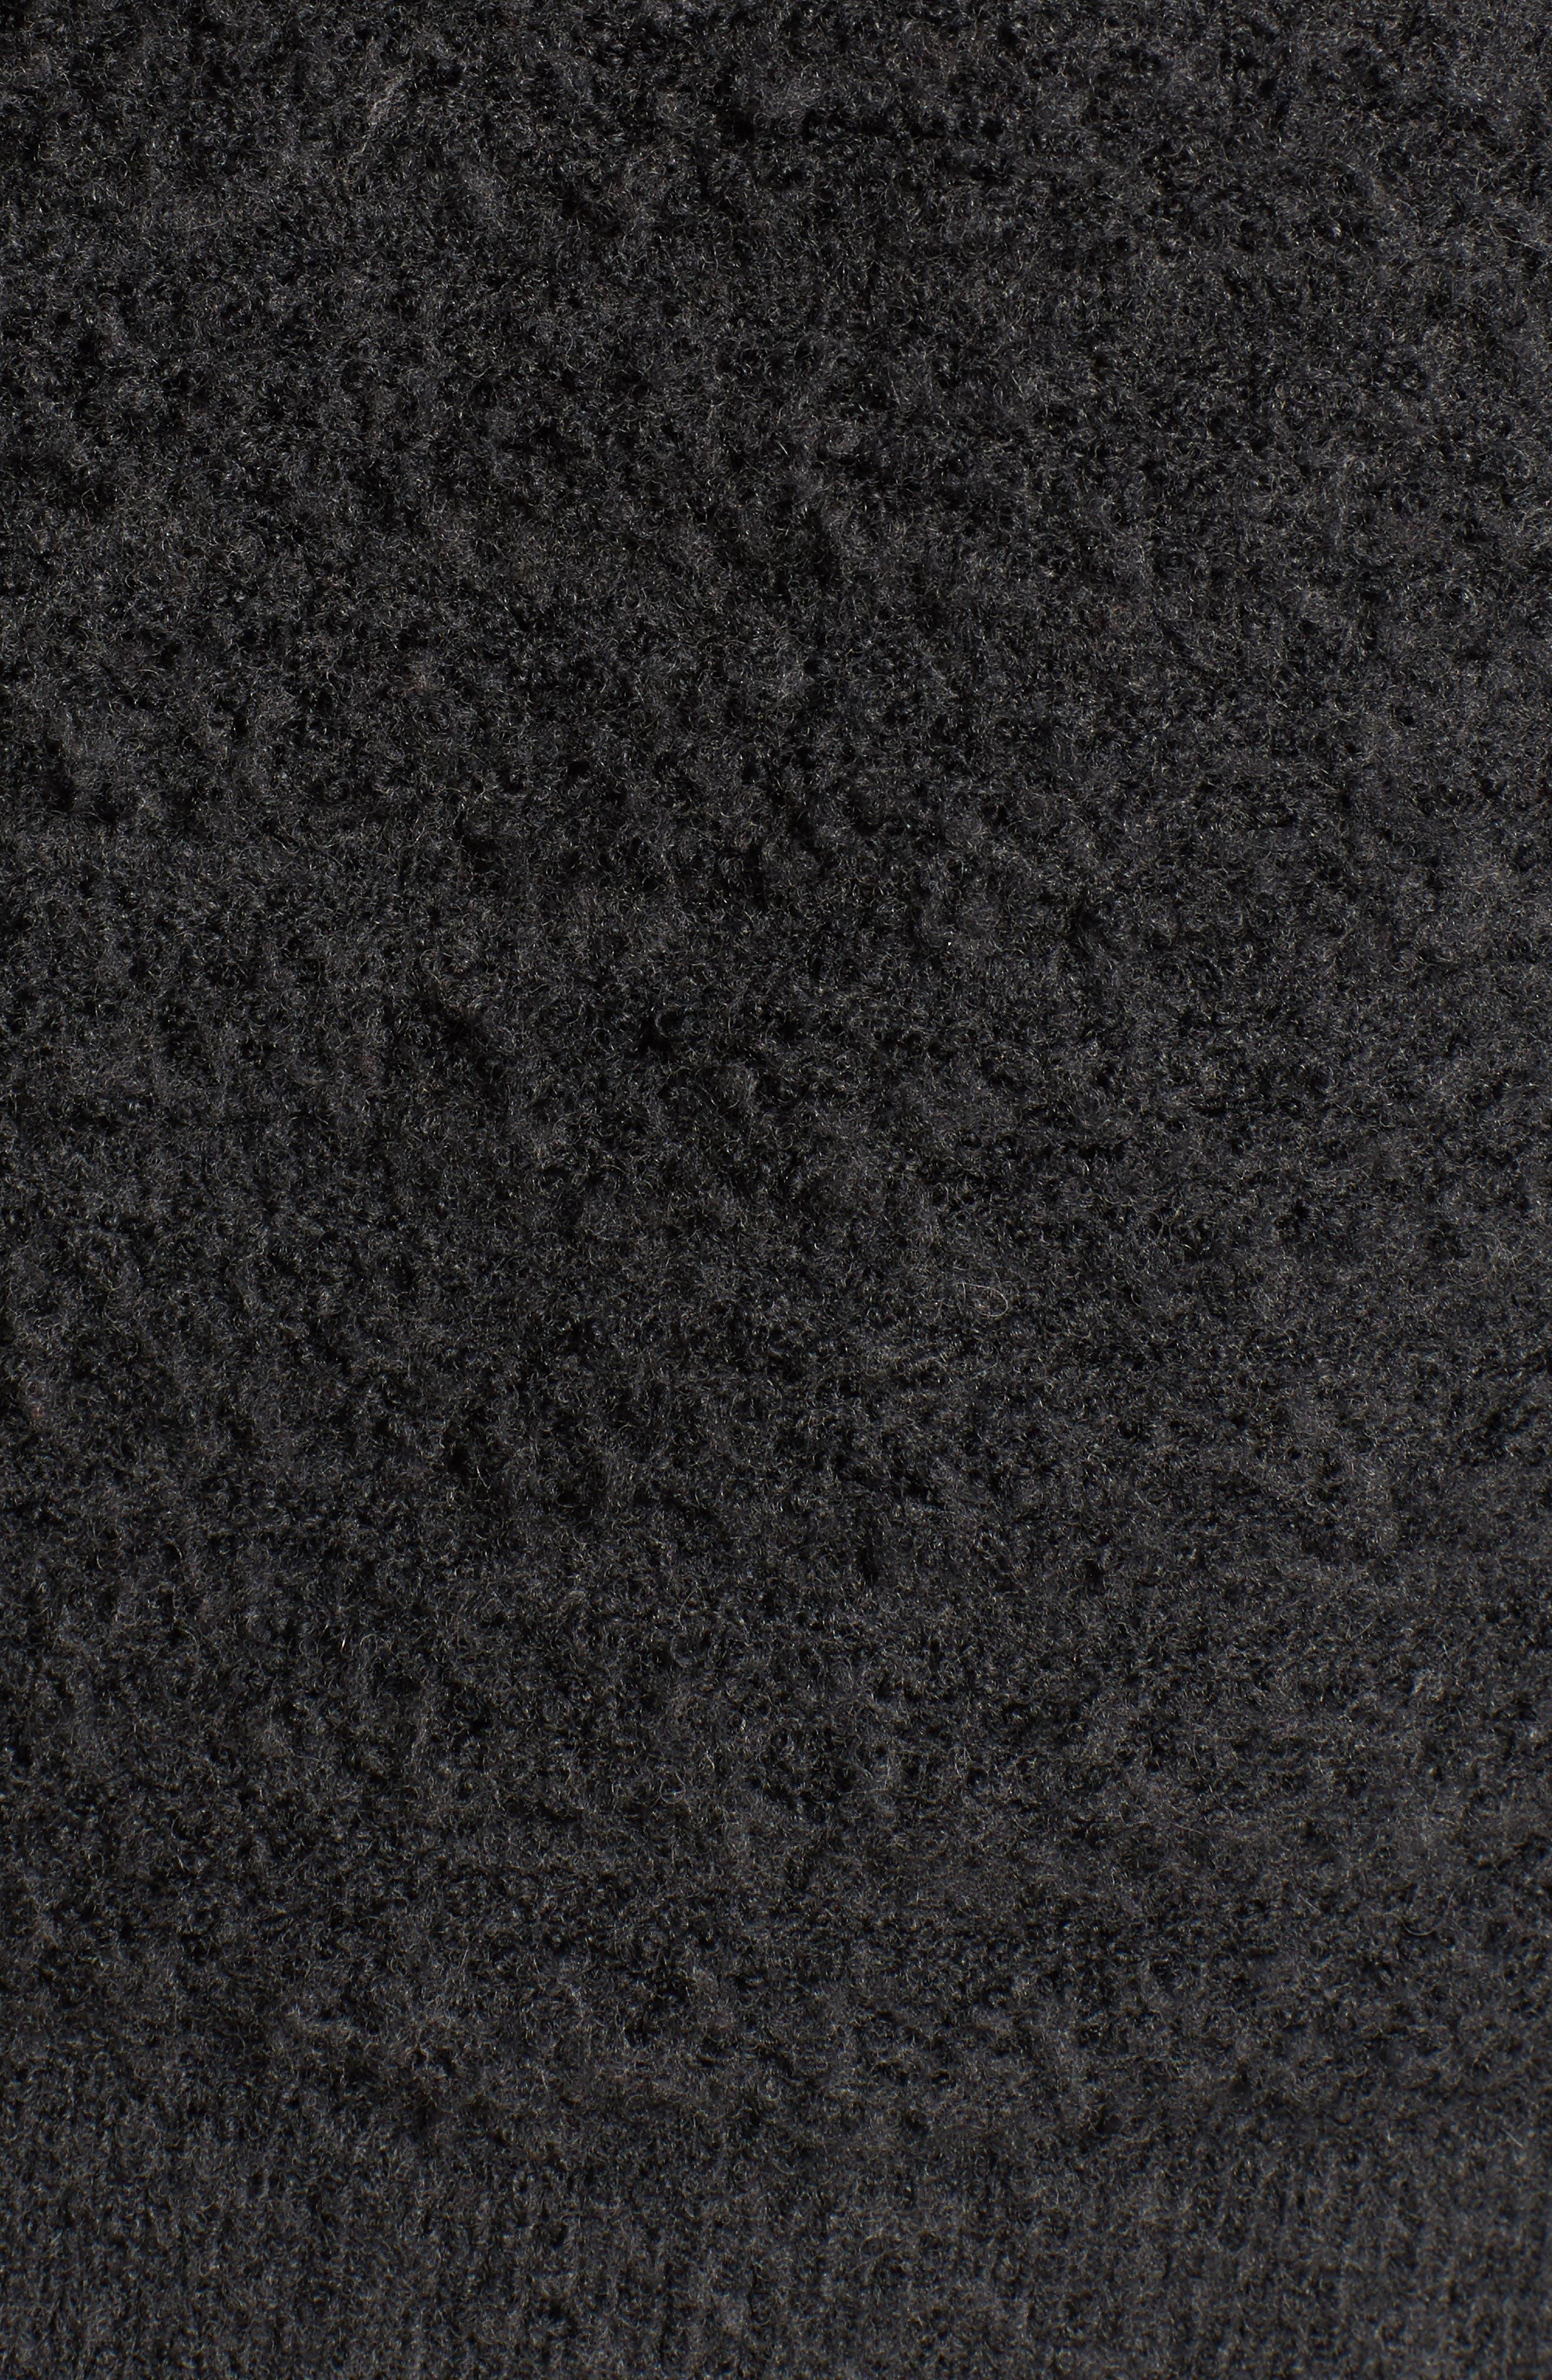 Cozy Stitch Cardigan,                             Alternate thumbnail 5, color,                             021